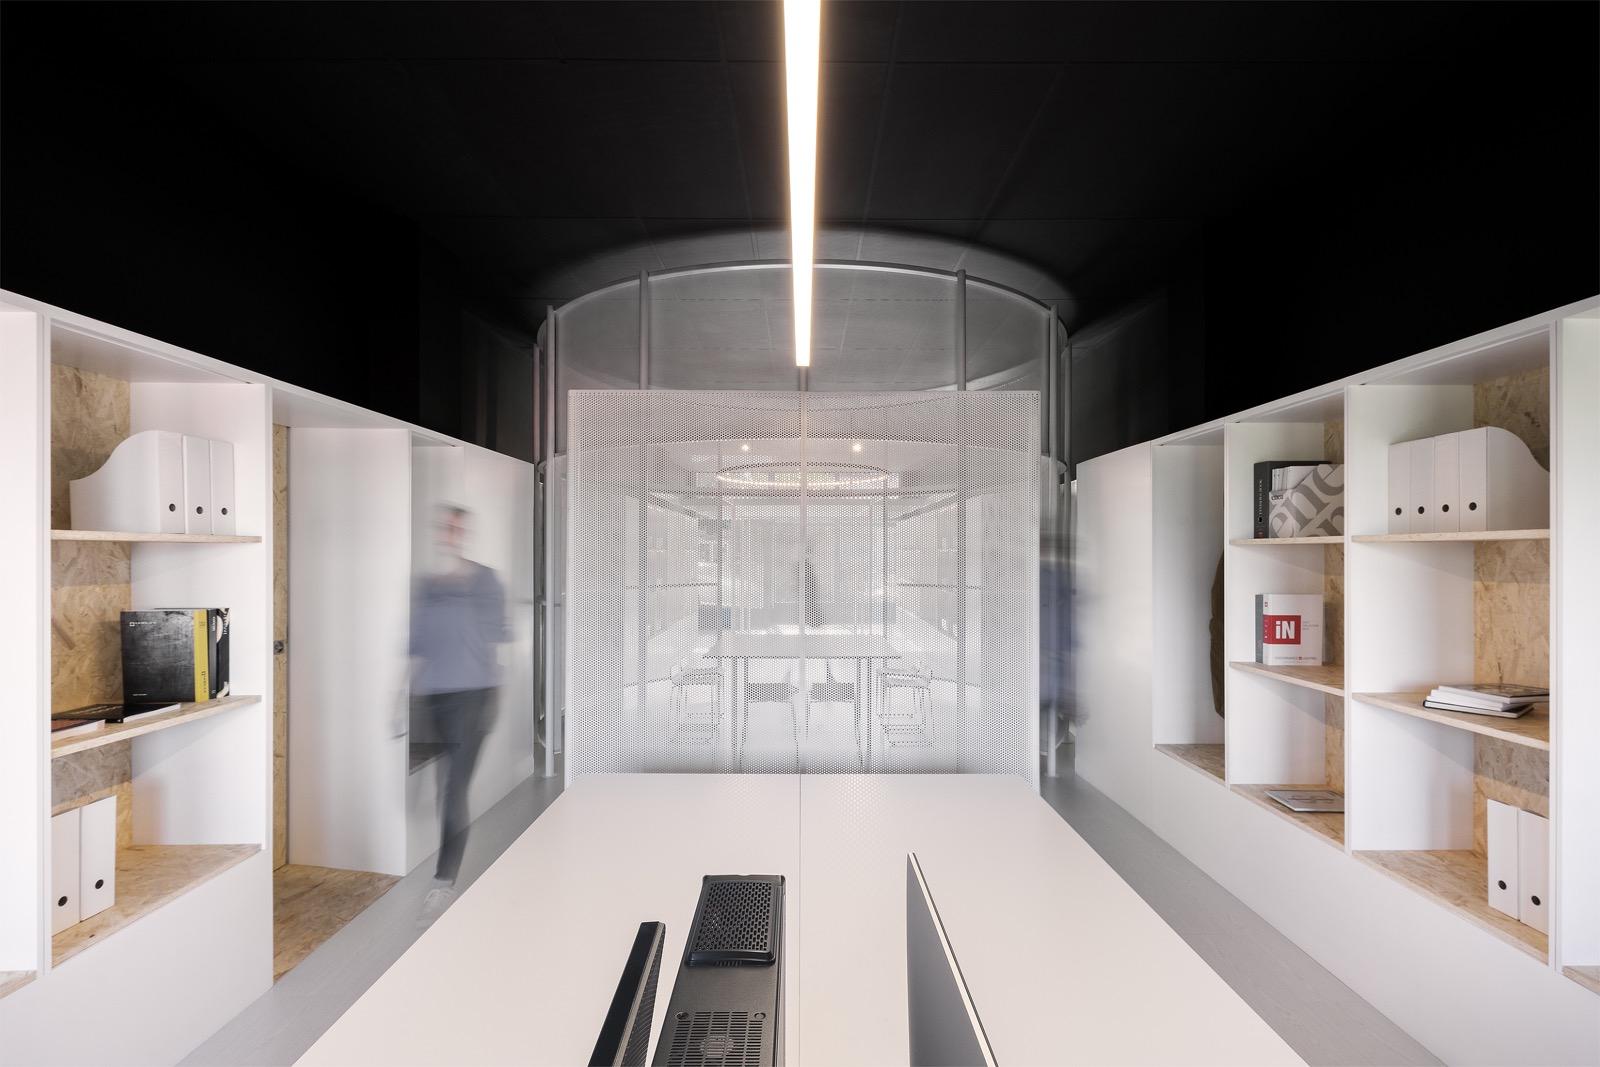 sra-emilia-office-11